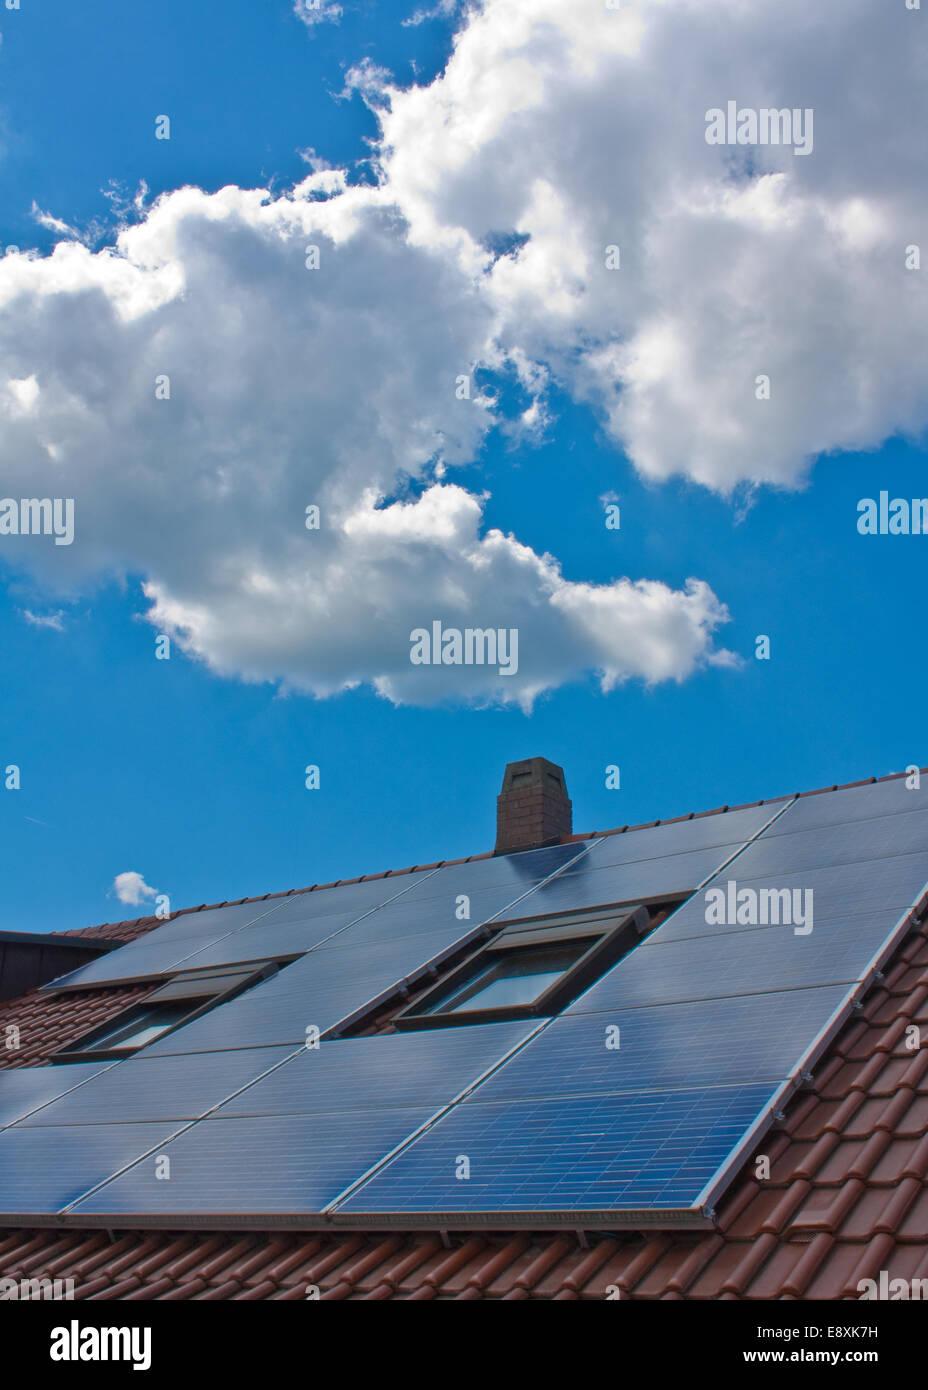 solar-power - Stock Image